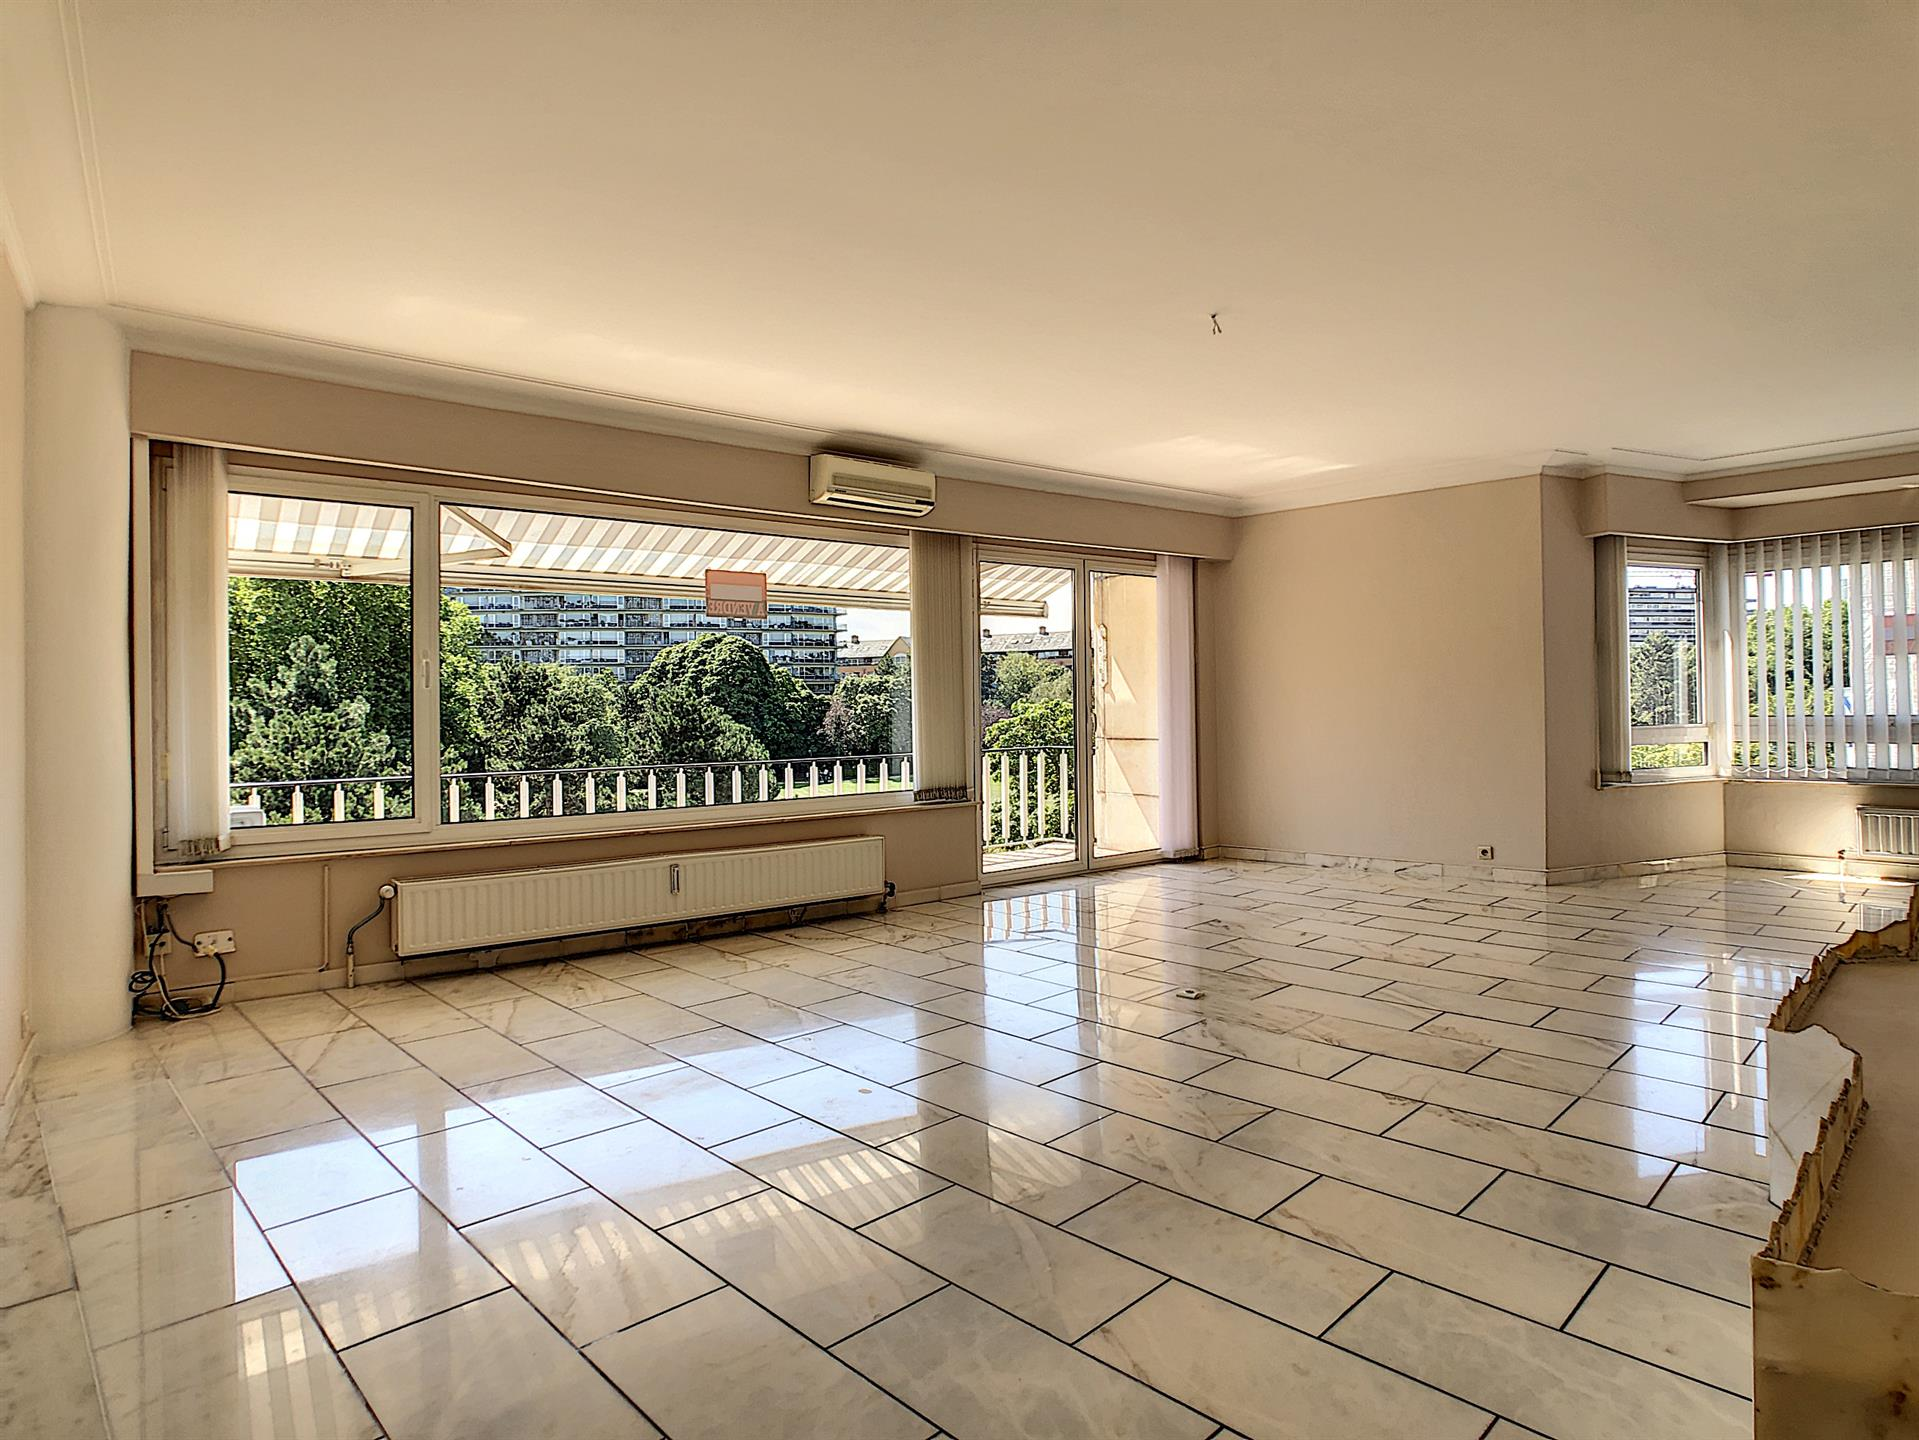 Appartement - Molenbeek-Saint-Jean - #4100298-2